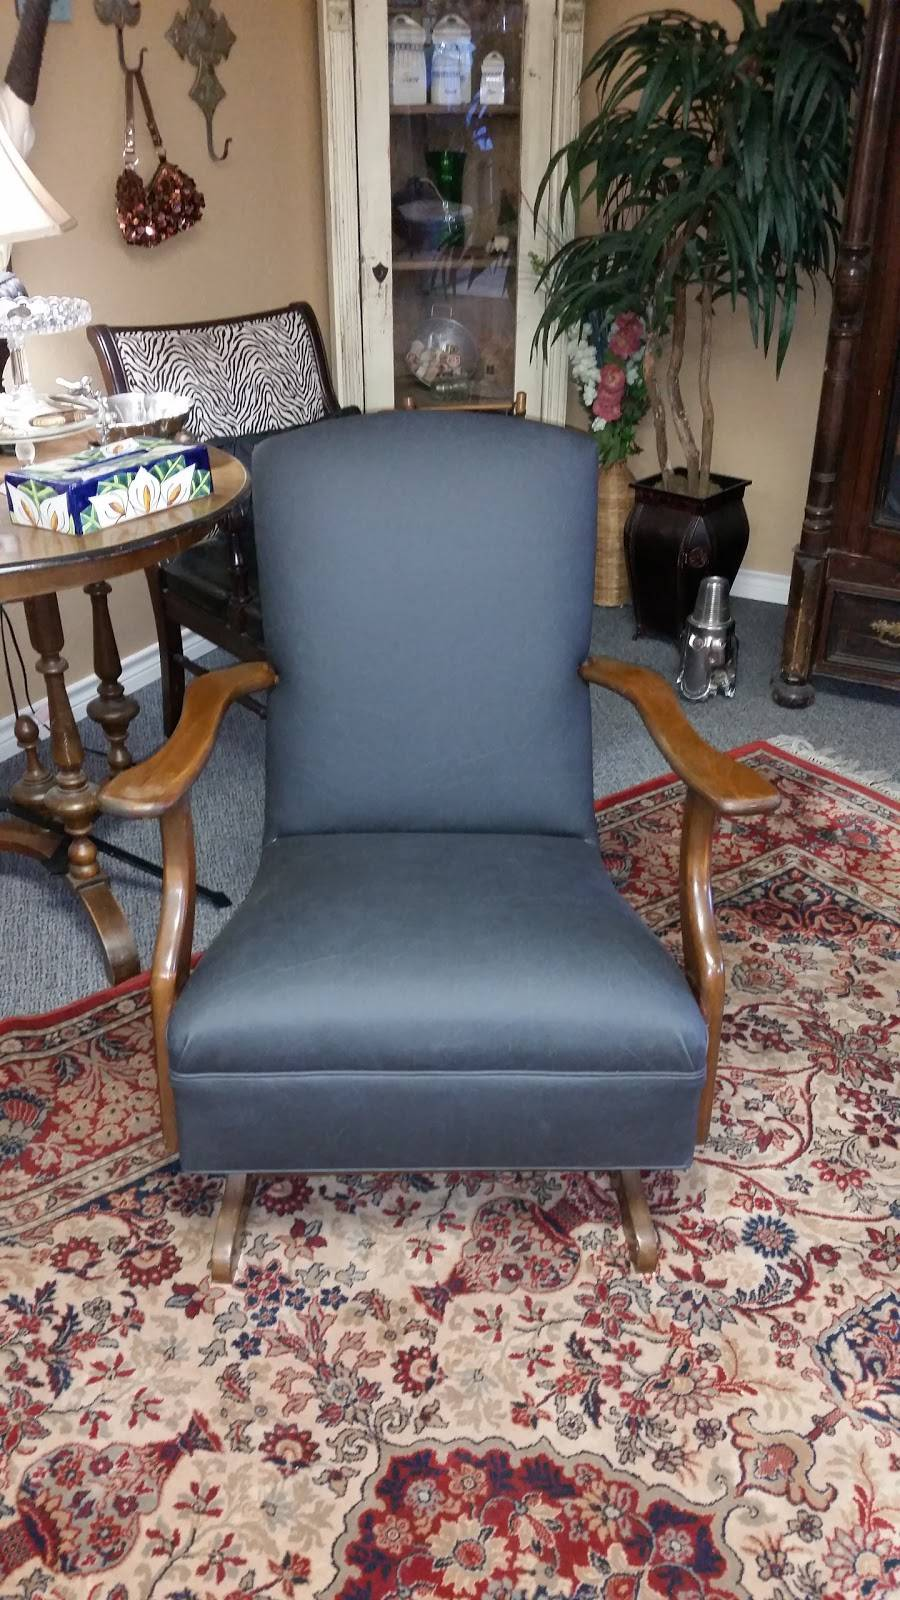 Classic Custom Upholstery - furniture store  | Photo 2 of 4 | Address: 9210 Converse Business Ln # 1, Converse, TX 78109, USA | Phone: (210) 658-0208